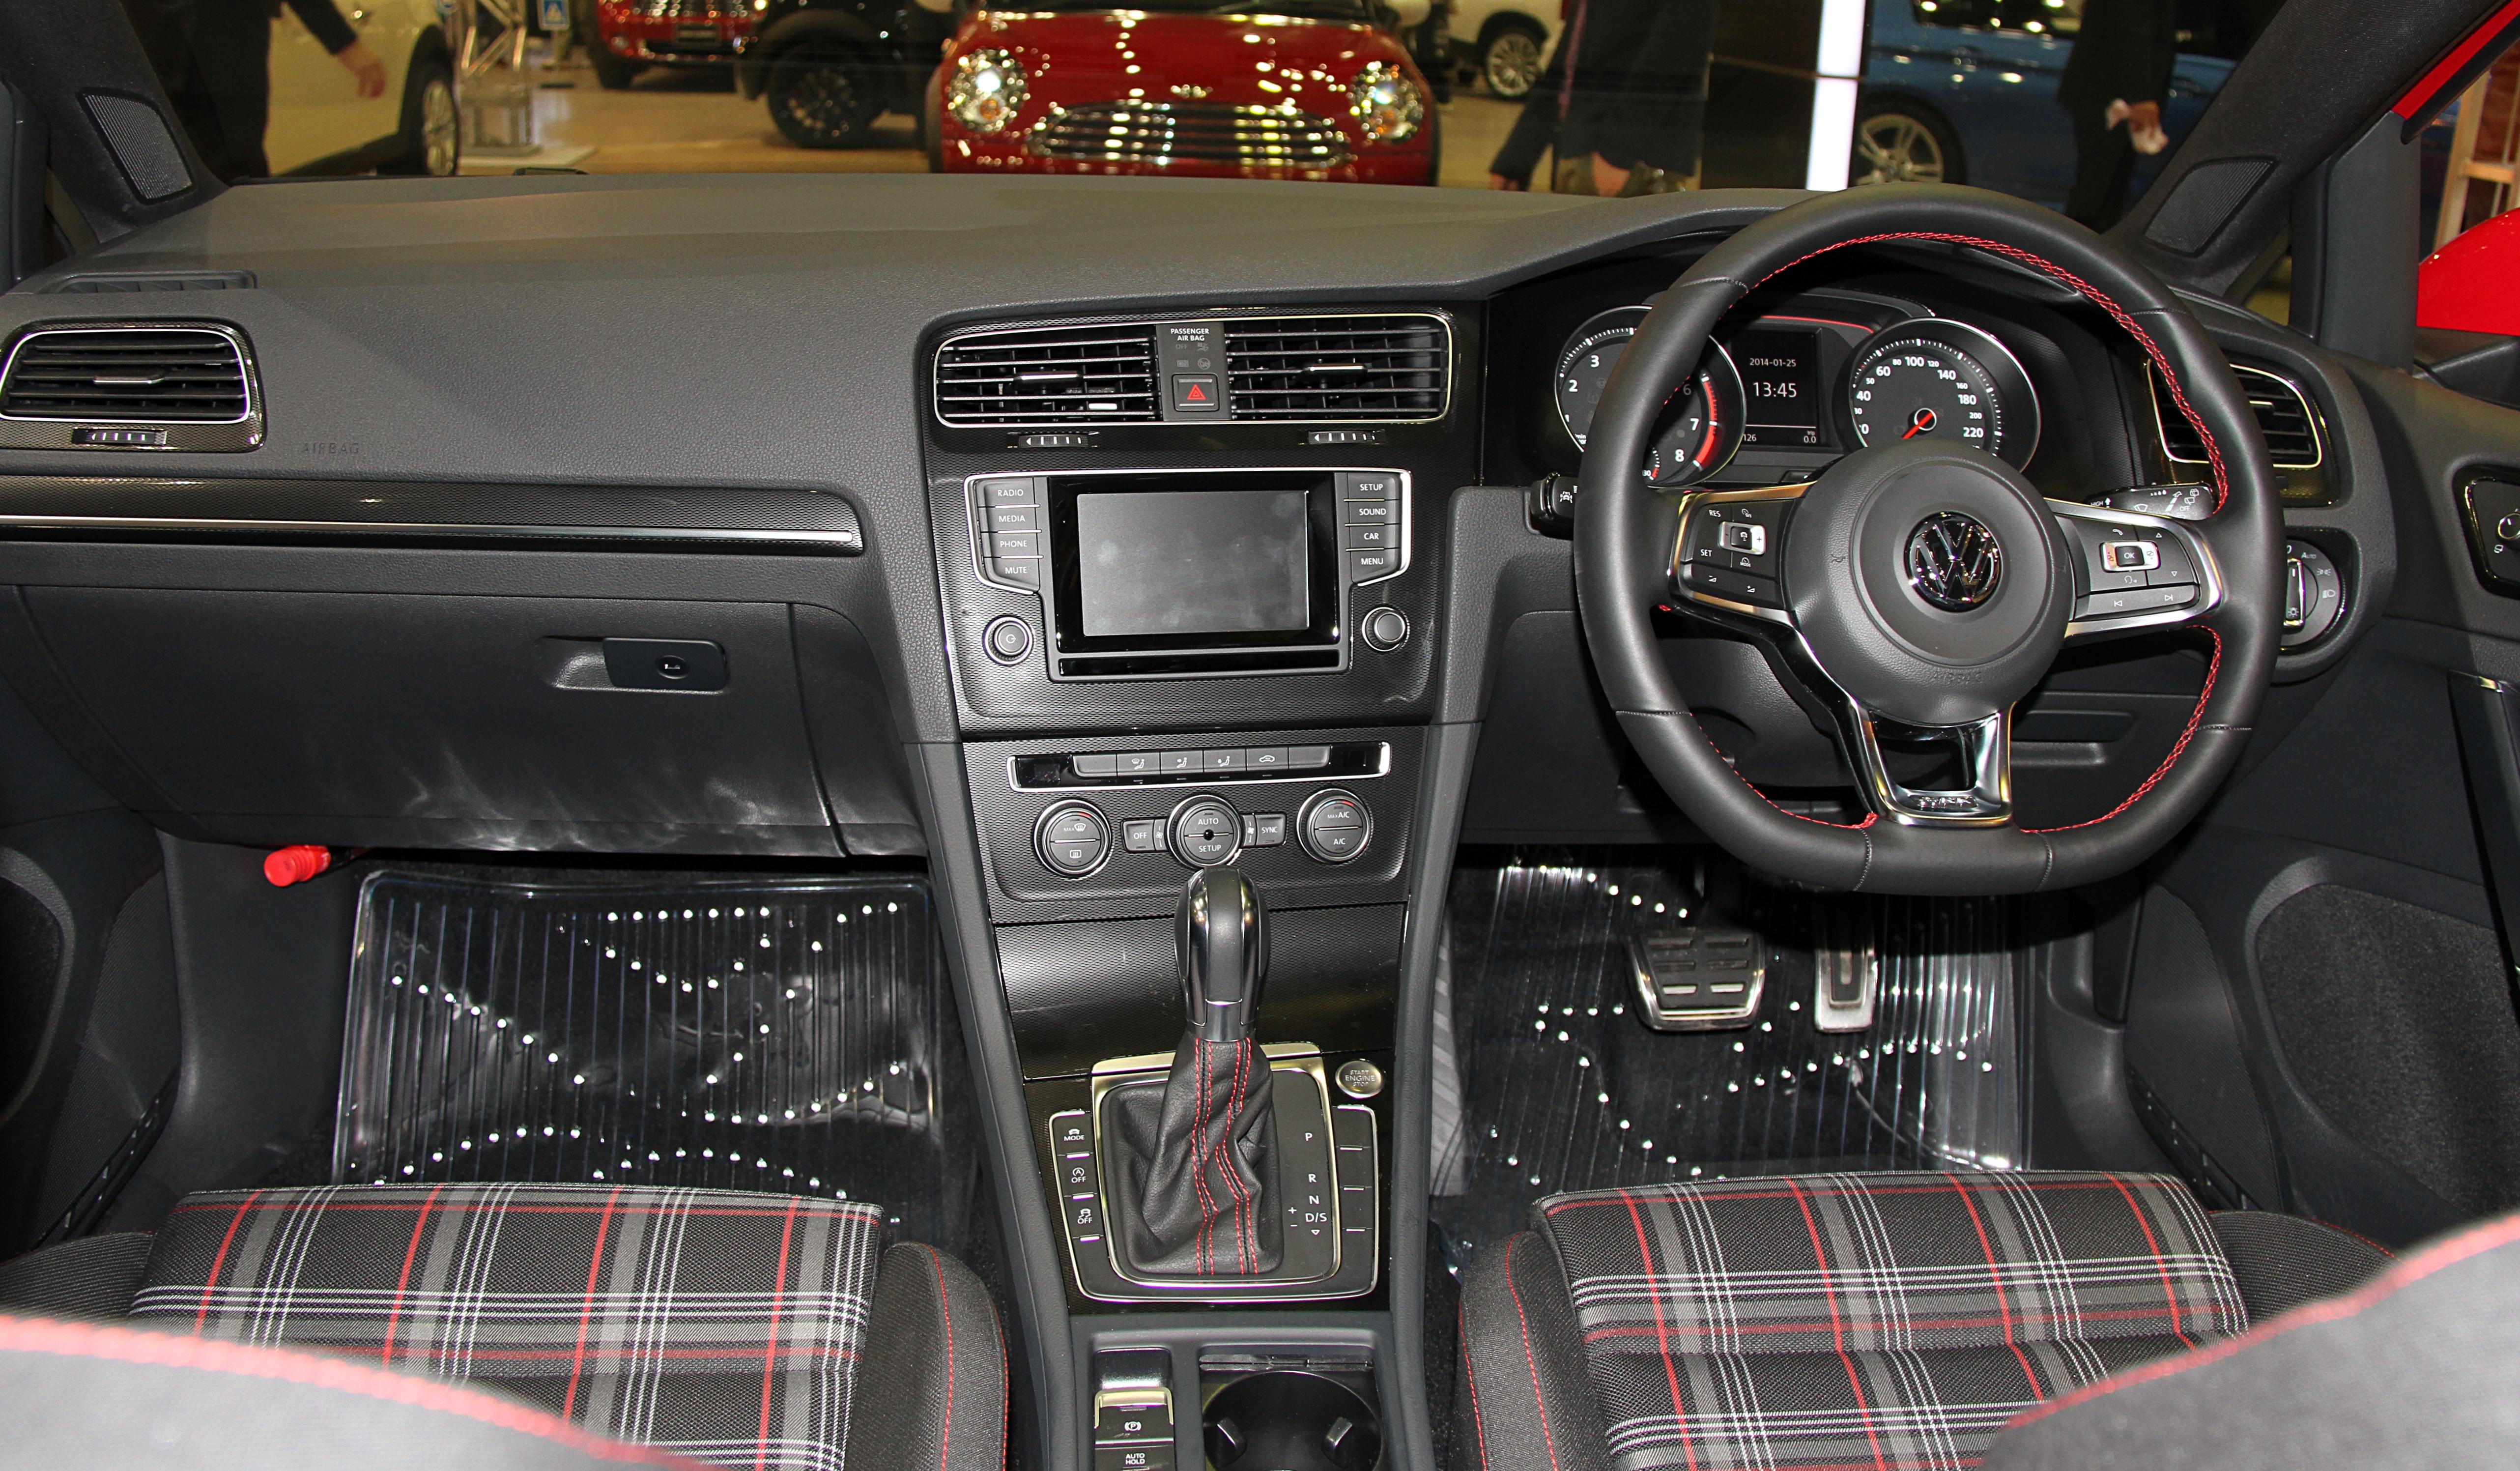 FileVolkswagen Golf GTI interiorjpg  Wikimedia Commons